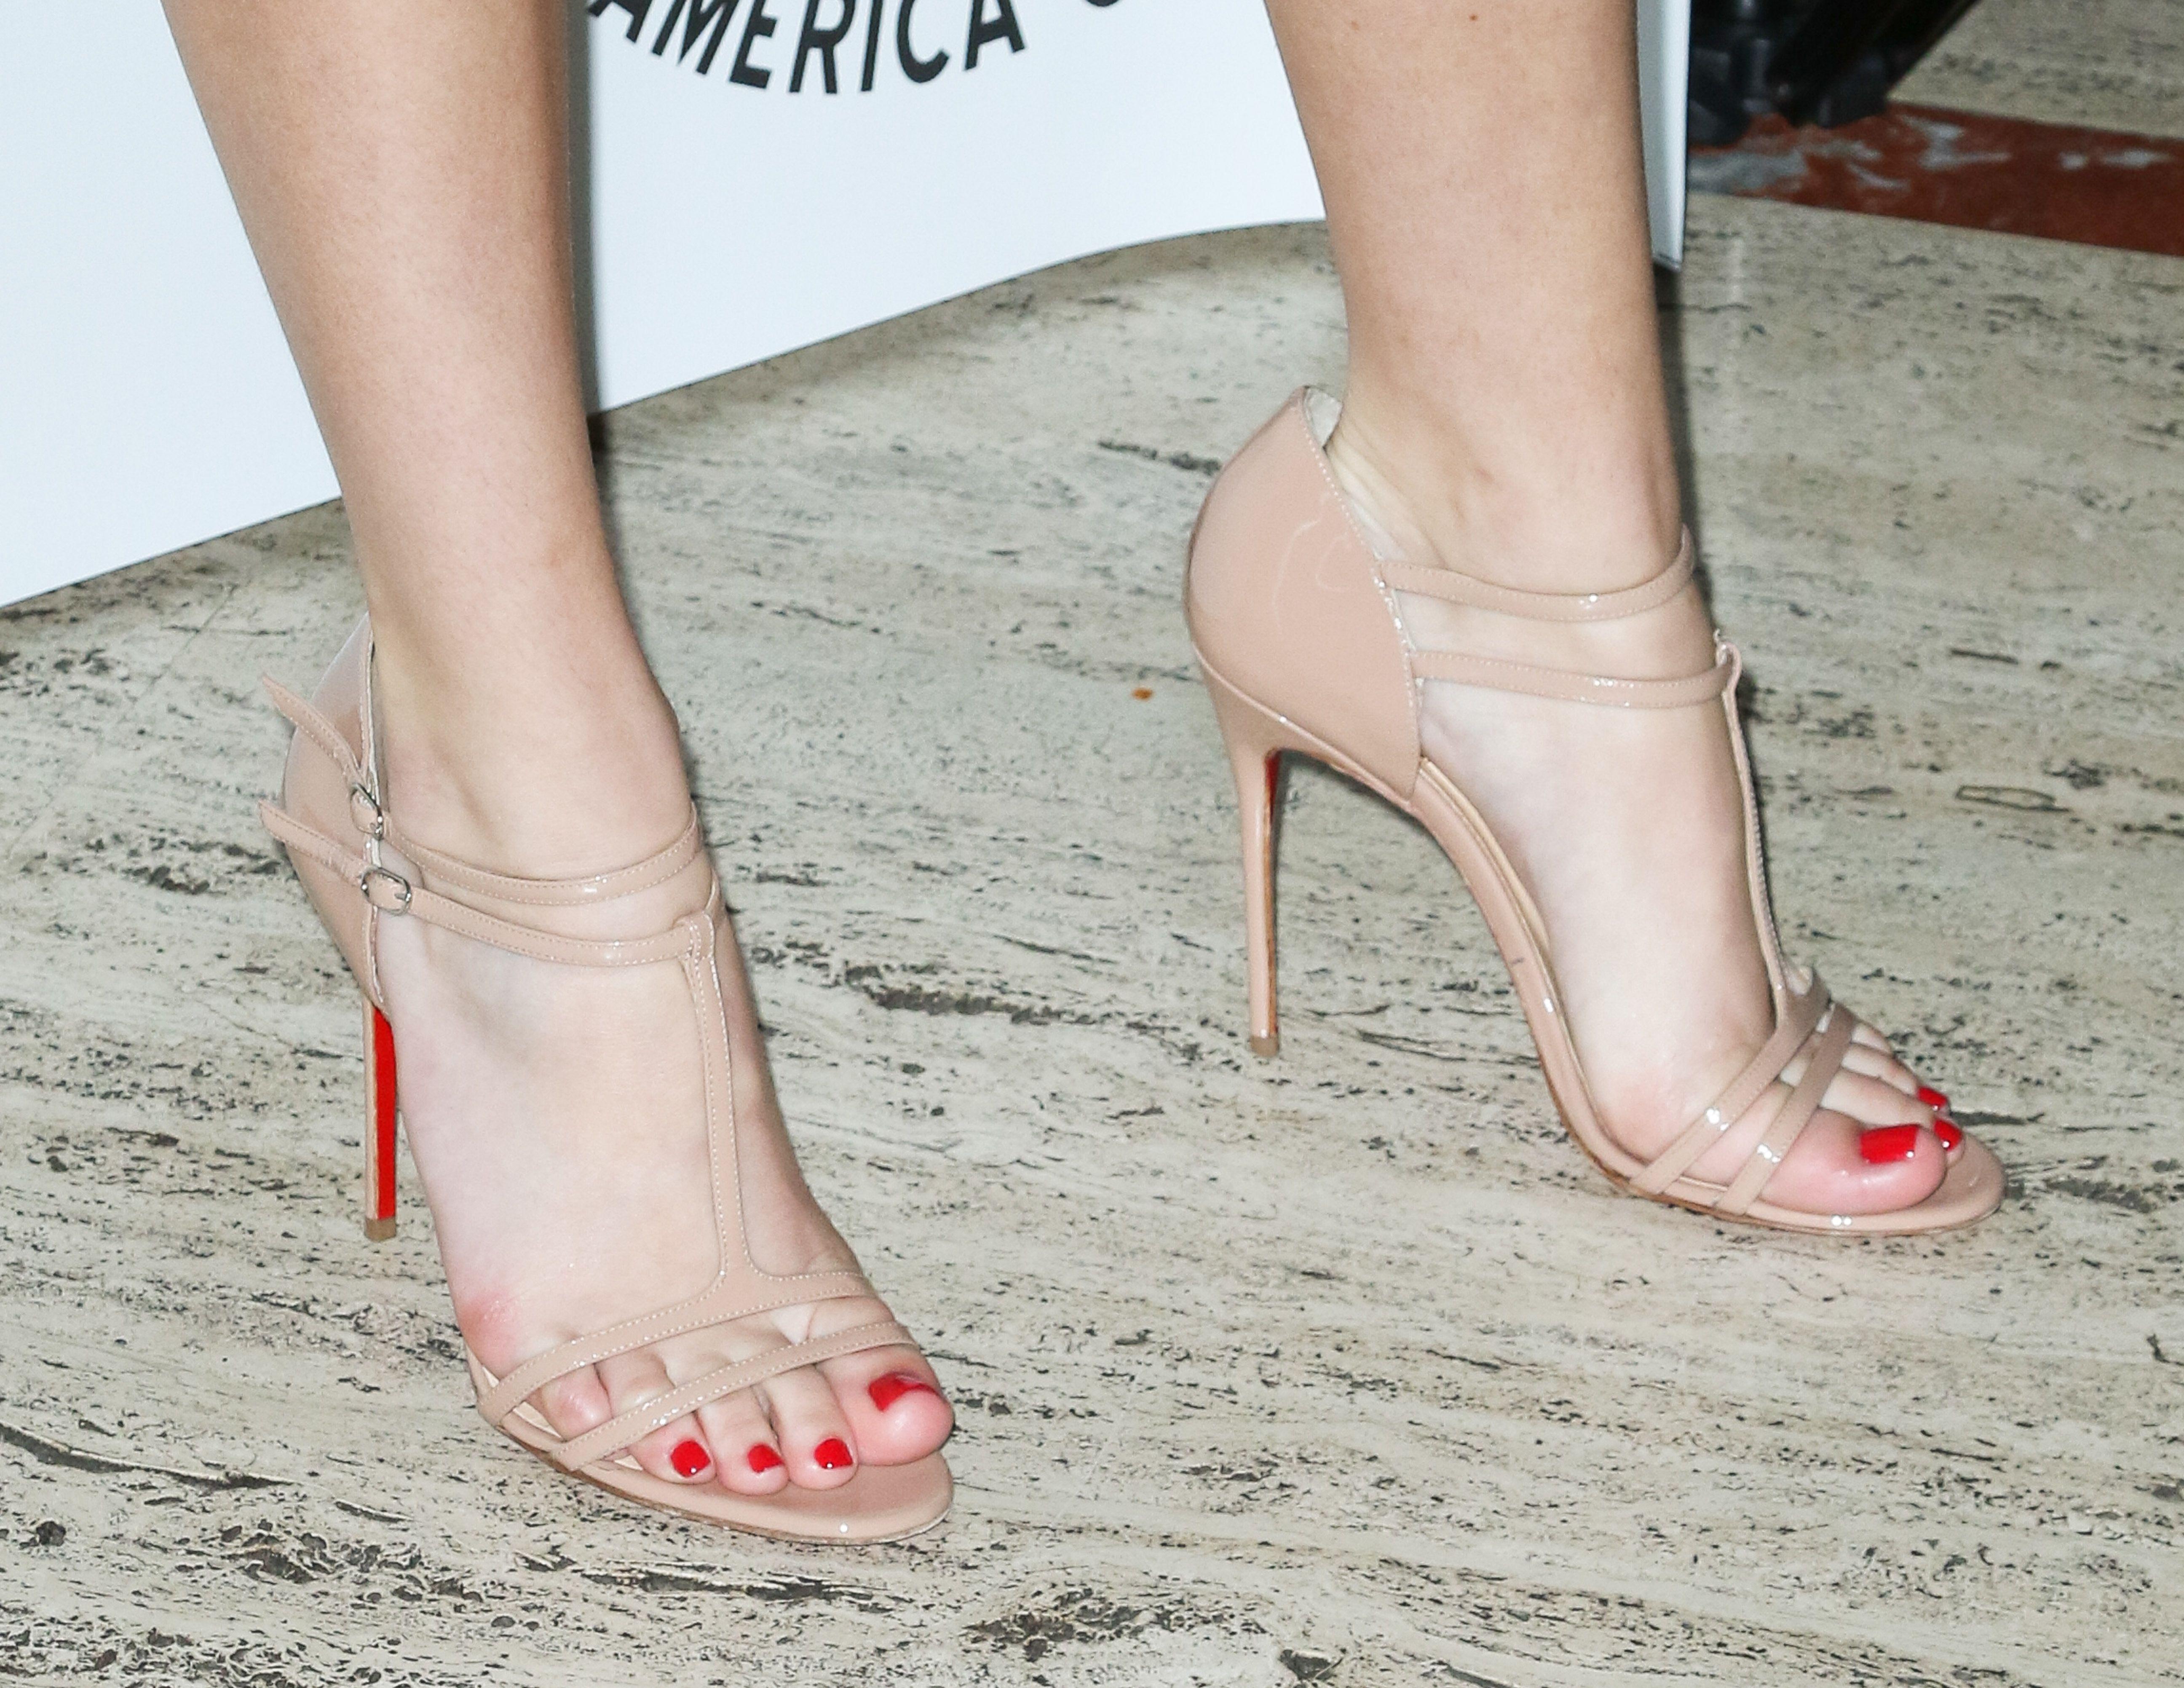 Pin on ❤️ Celeb feet OMG ⍭